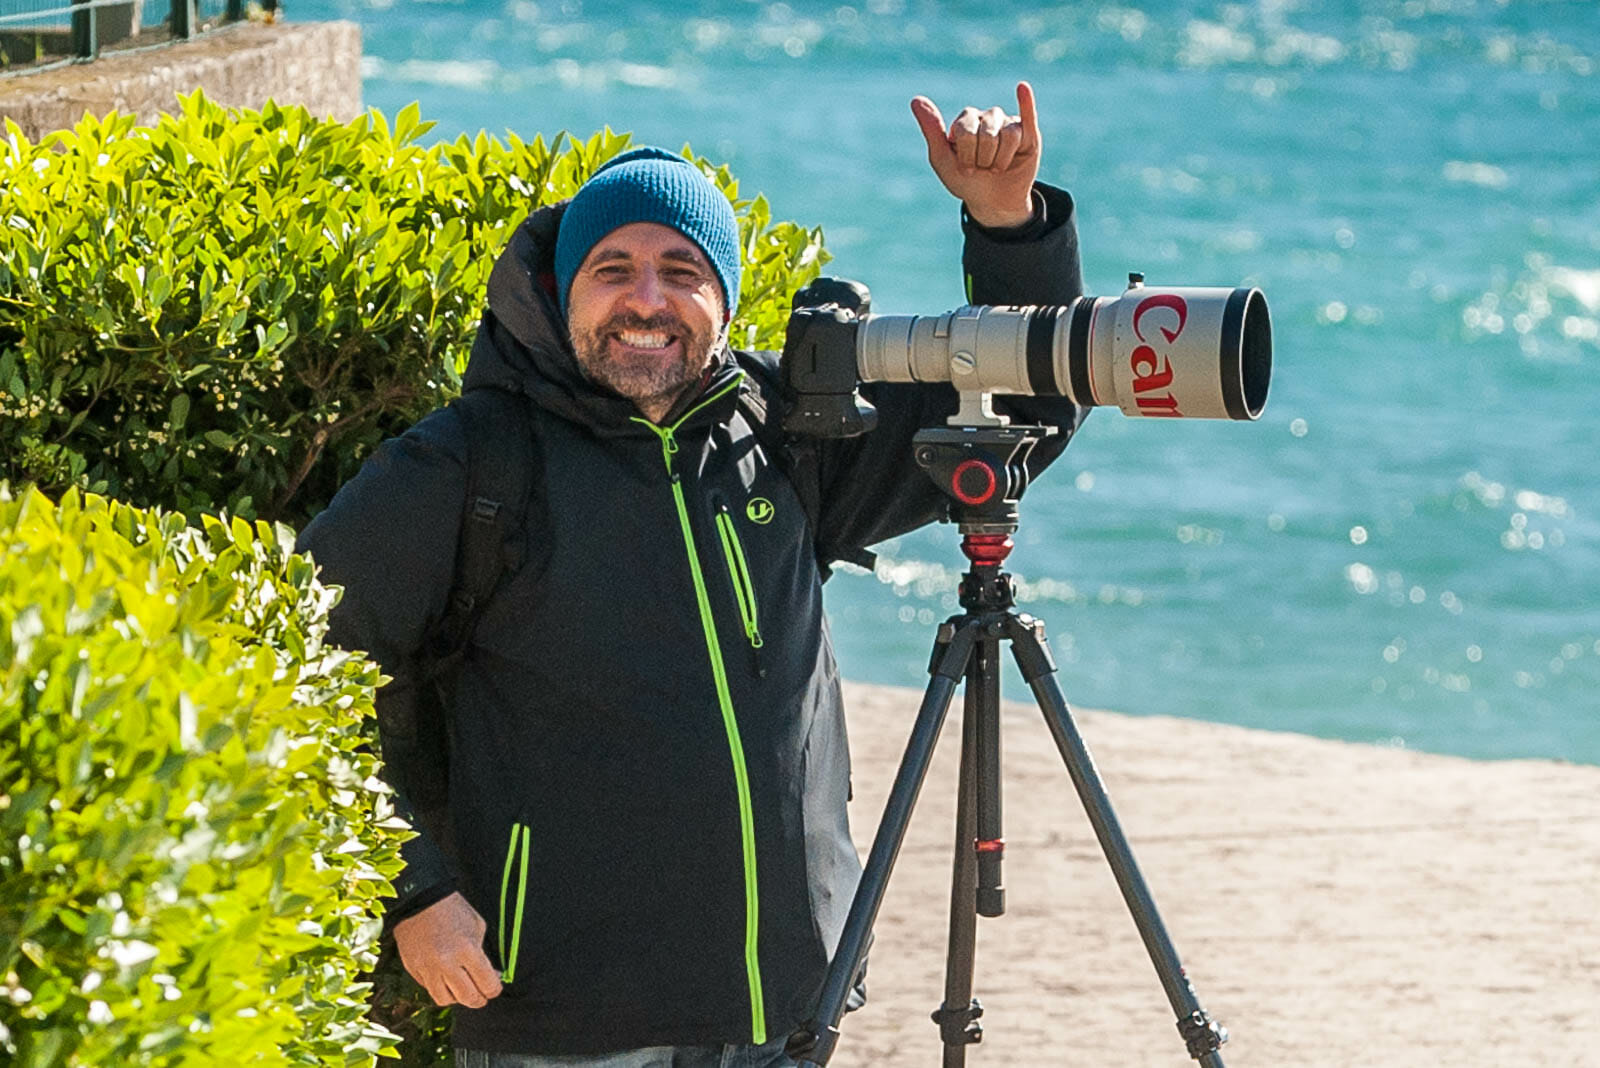 fiore photographer